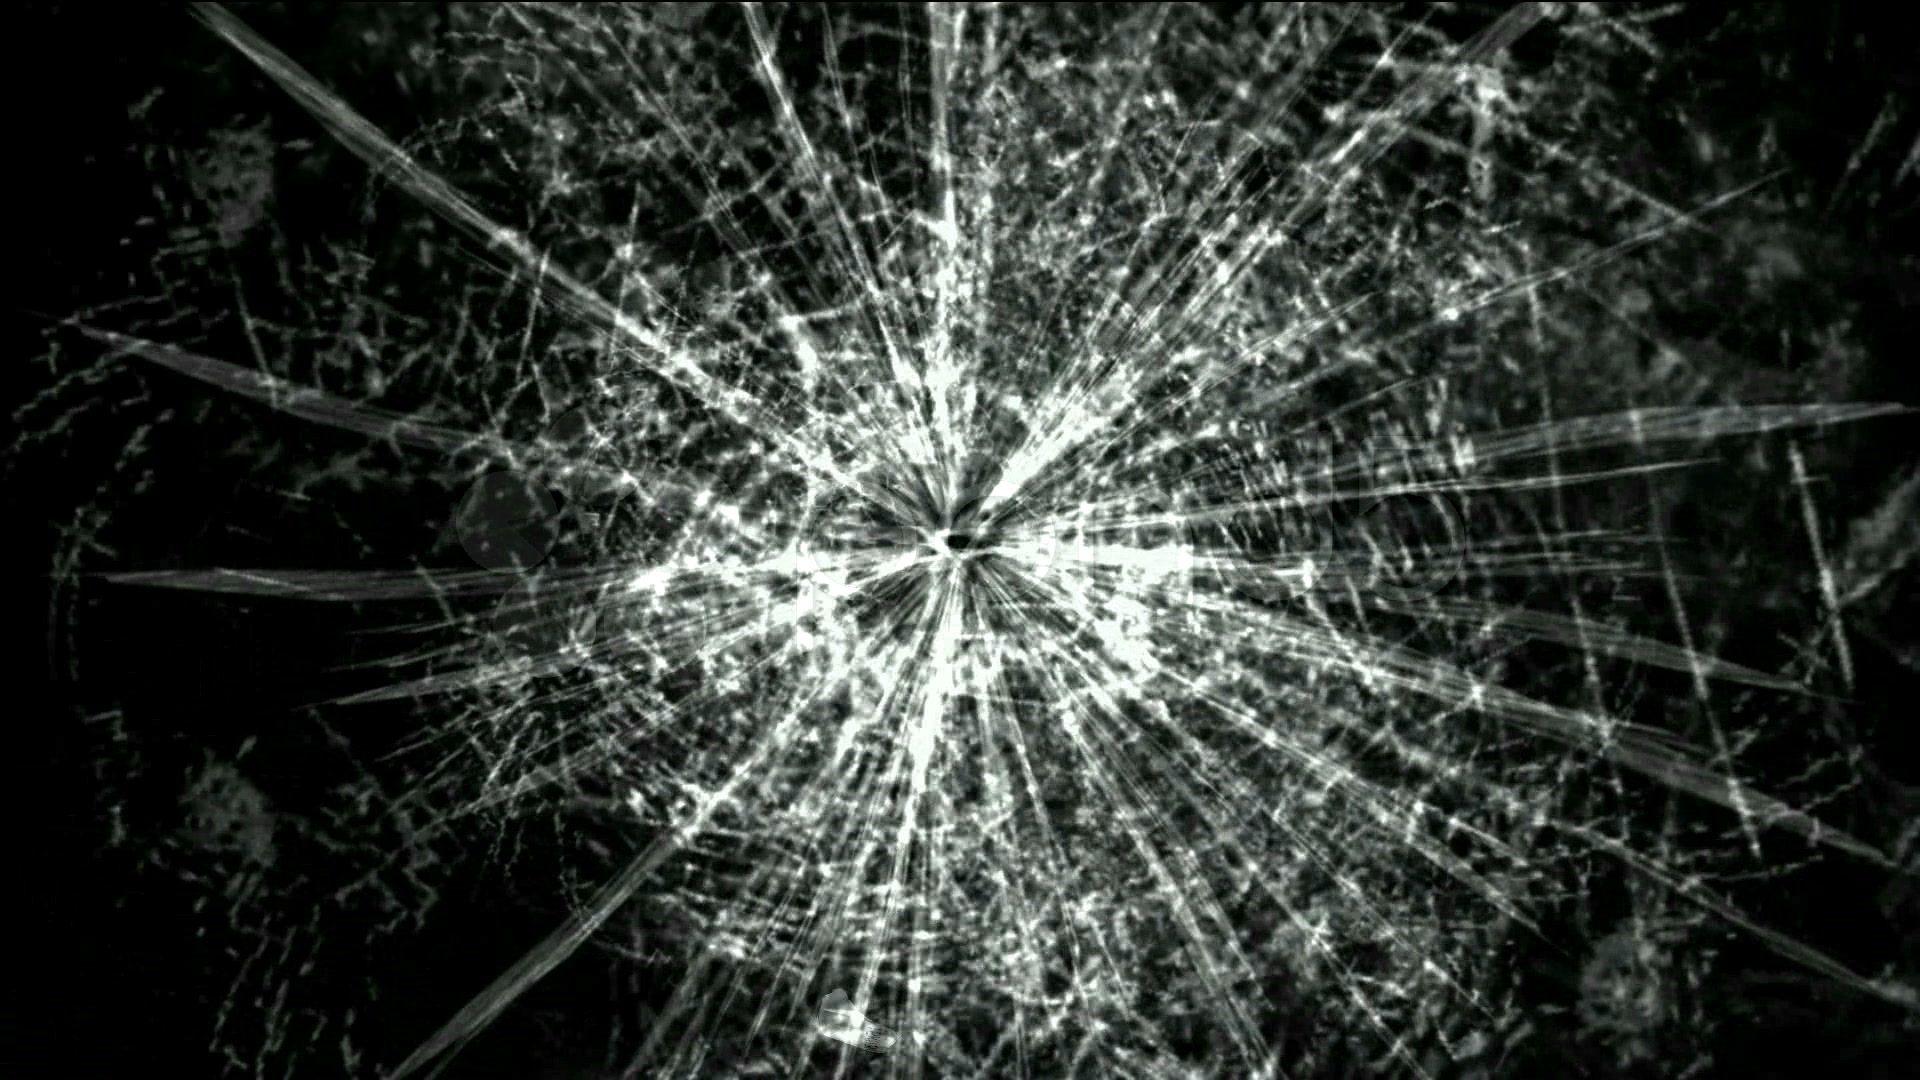 Broken Glass Texture Wallpaper Broken Screen Wallpaper Broken